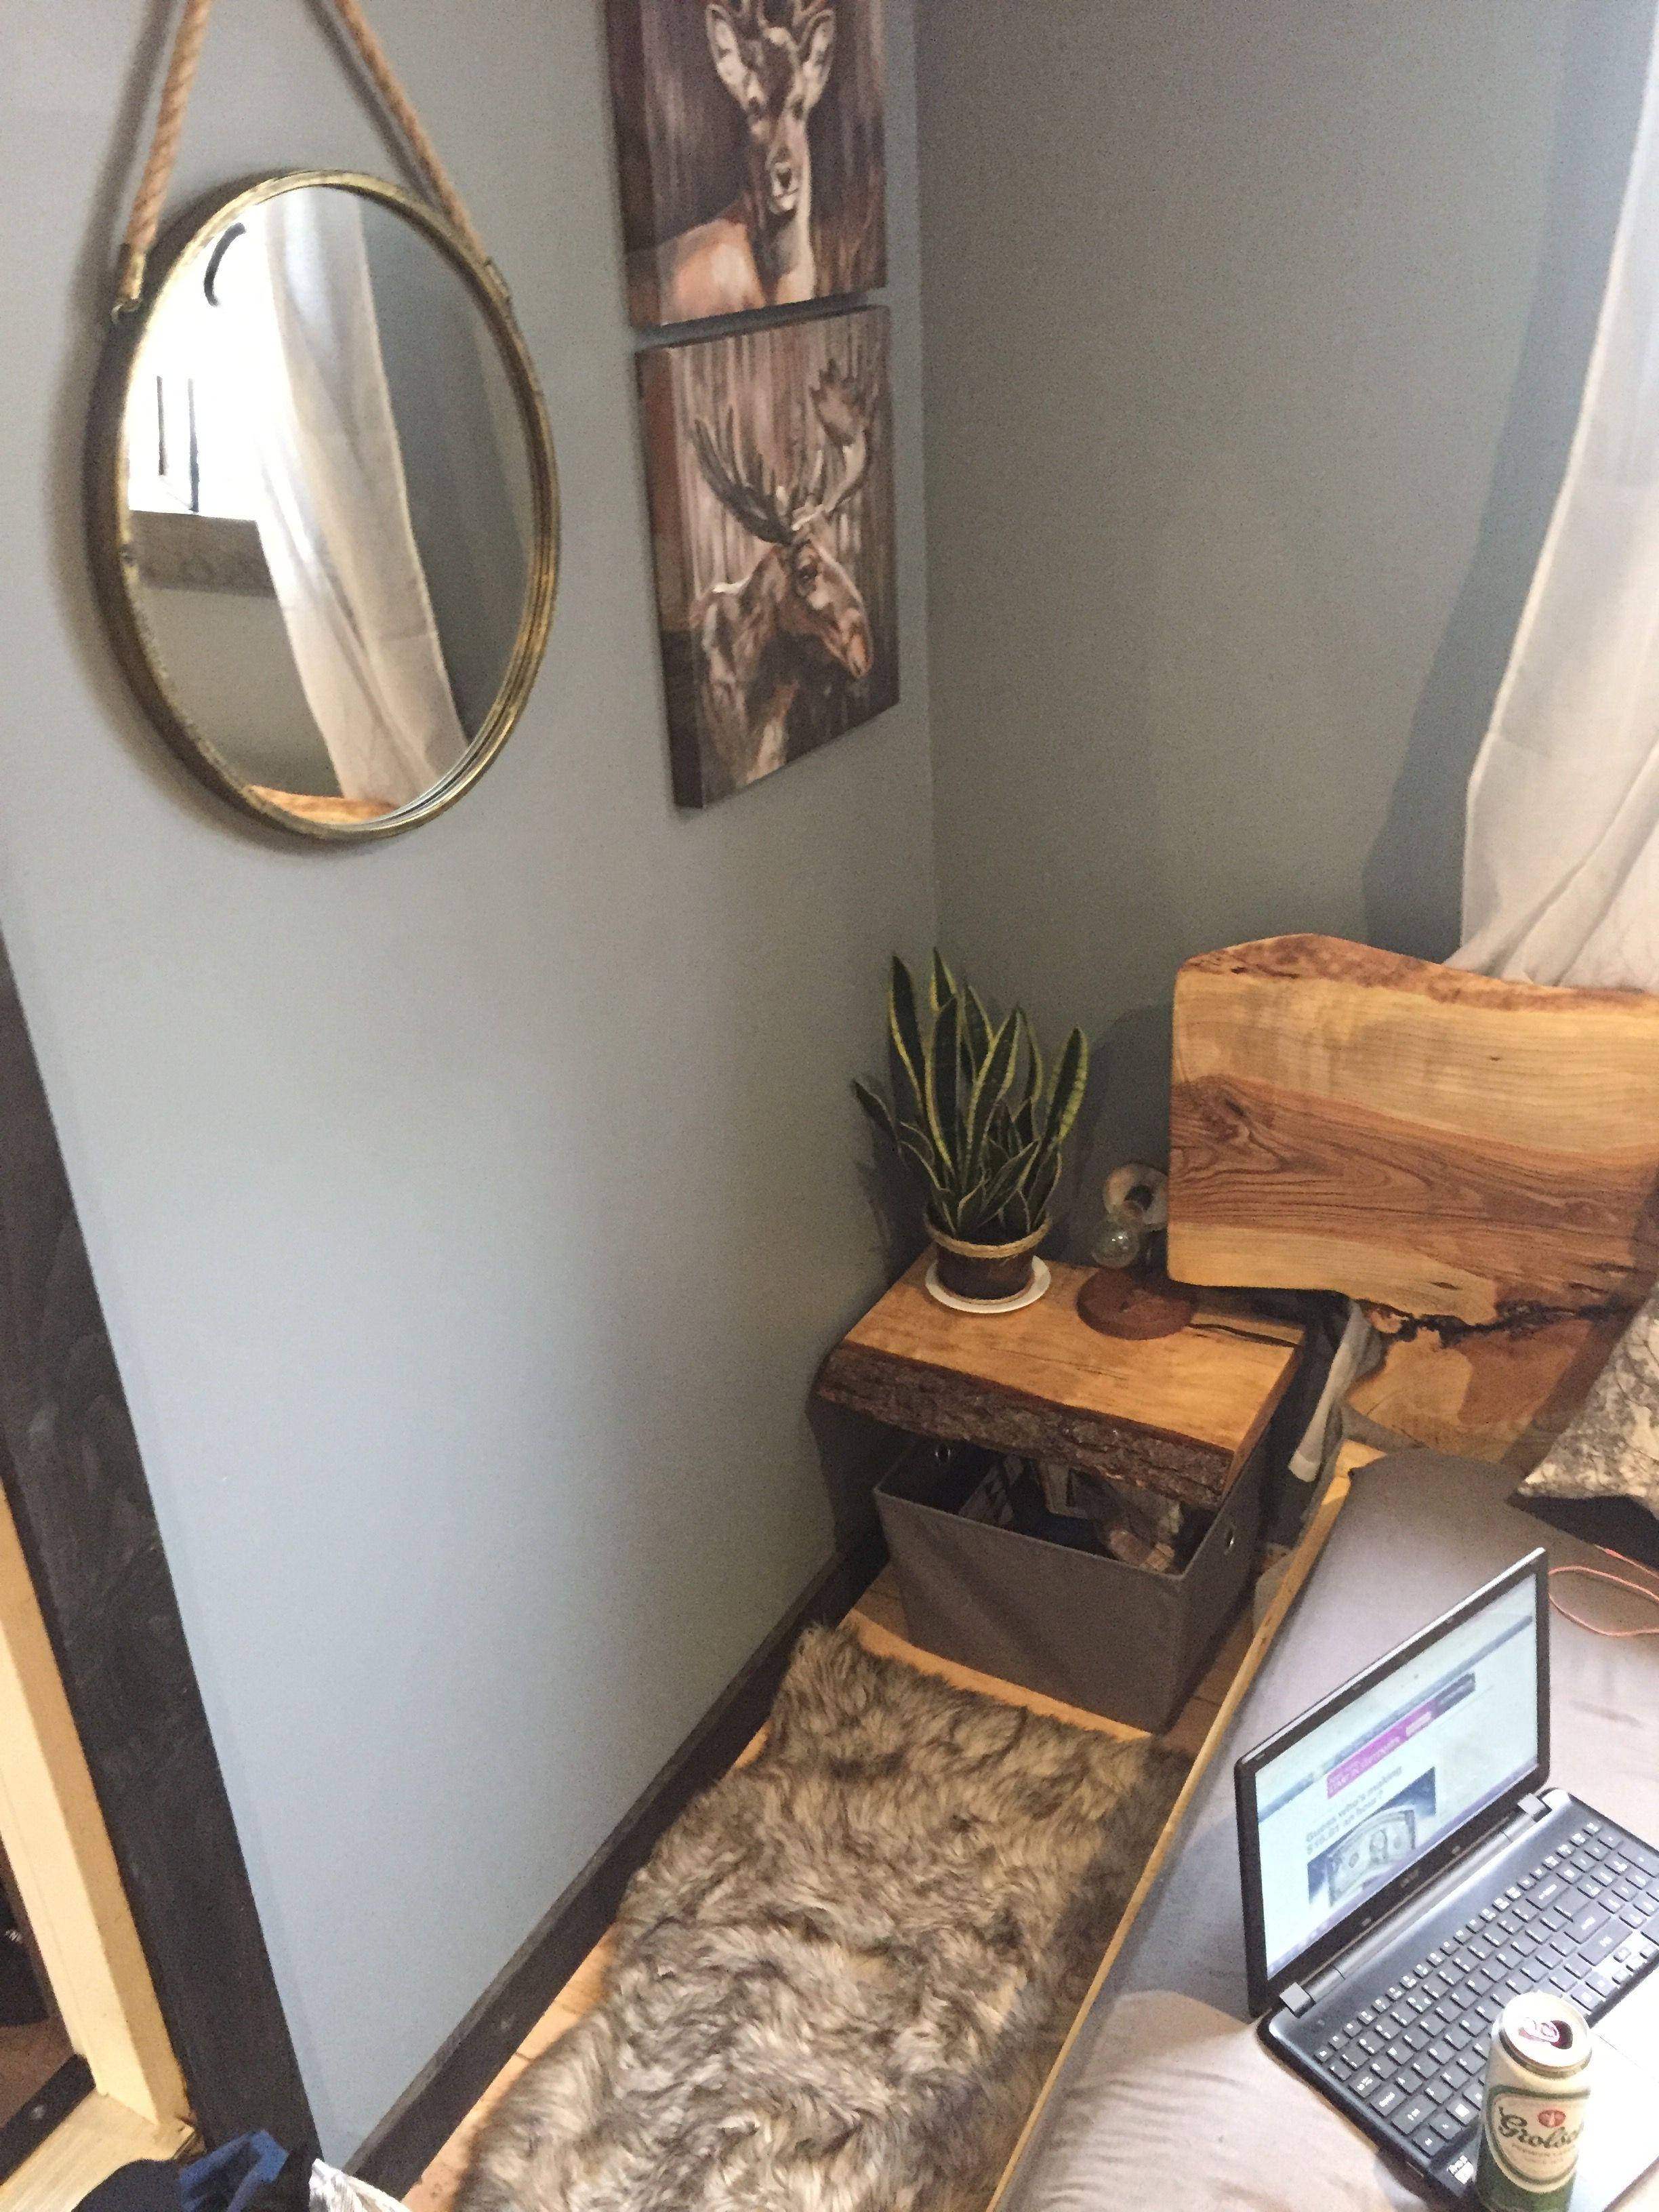 Dreamt rustic and feminine bedroom decor live edge wood bed frame